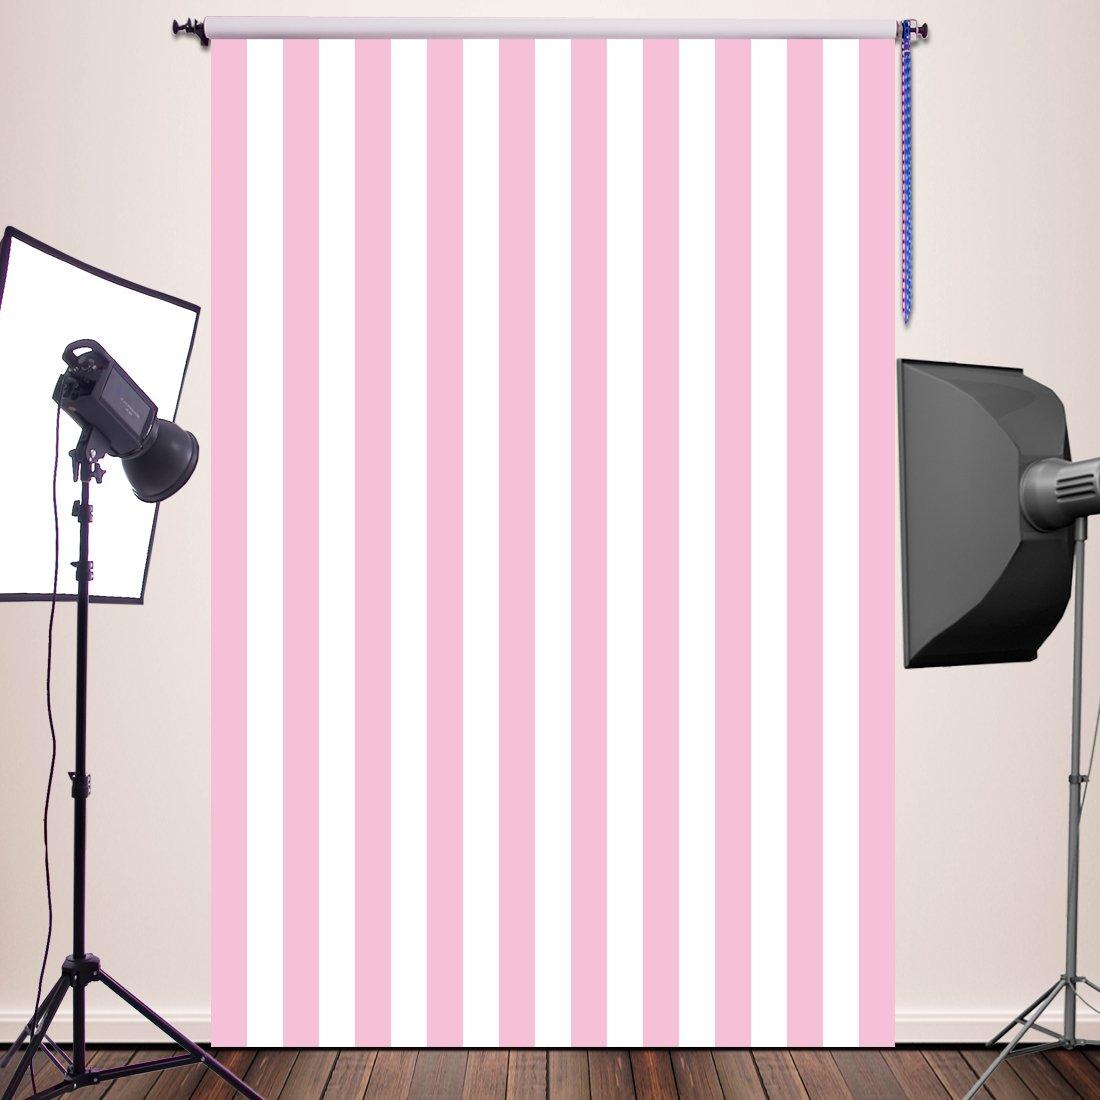 HUAYI Pink White Stripe Background Silk Photography Backdrops Newborn Photo Studio Photo Props 5x7ft YJ-234